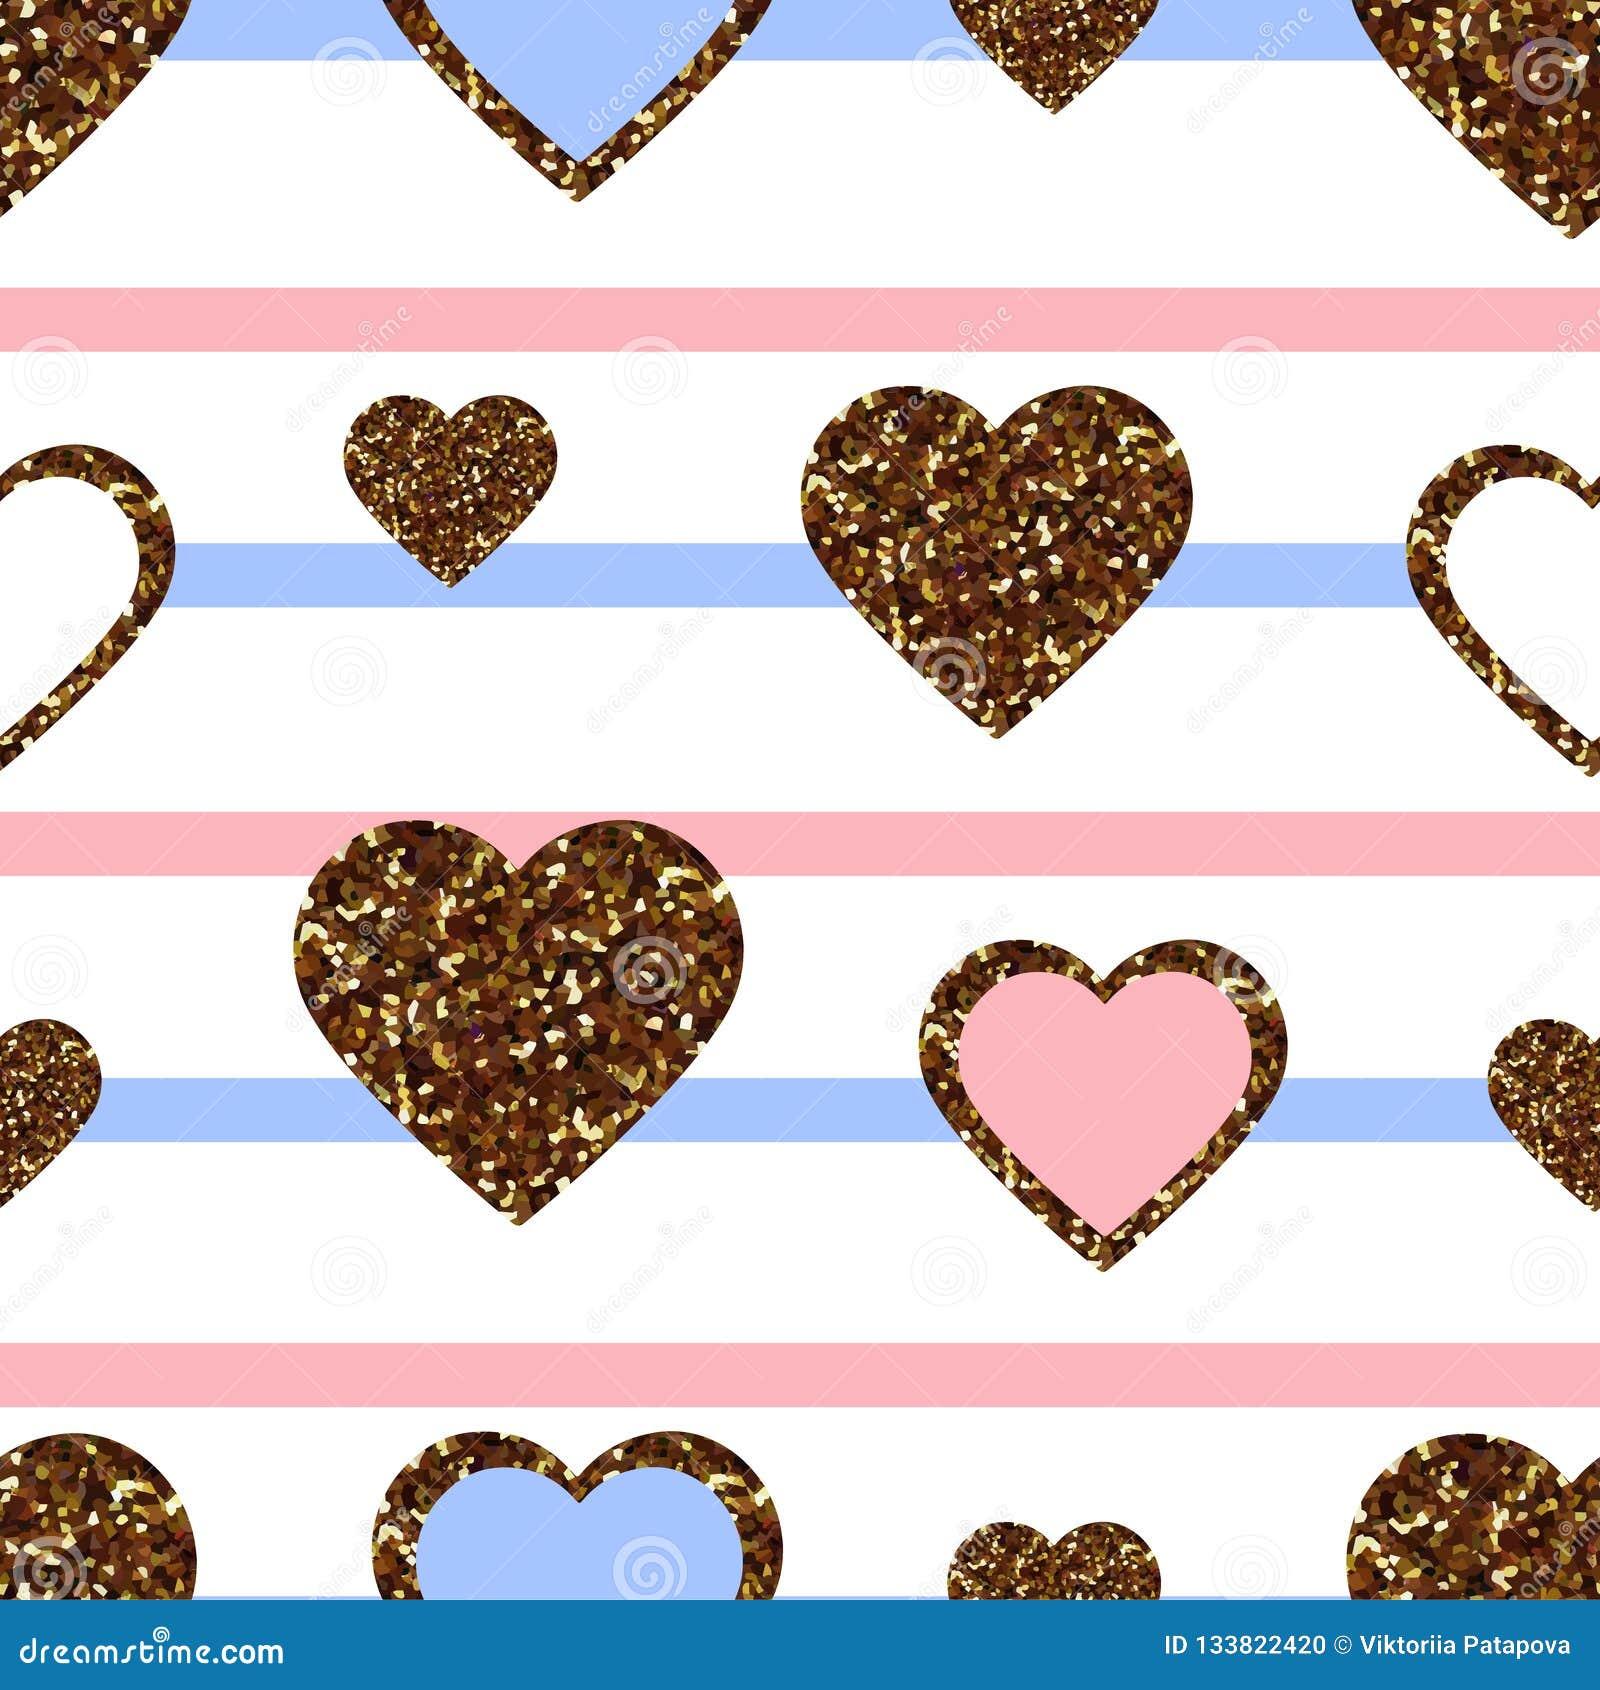 gold glitter heart seamless pattern symbol love valentine day holiday design wallpaper background fabric texture gold glitter 133822420